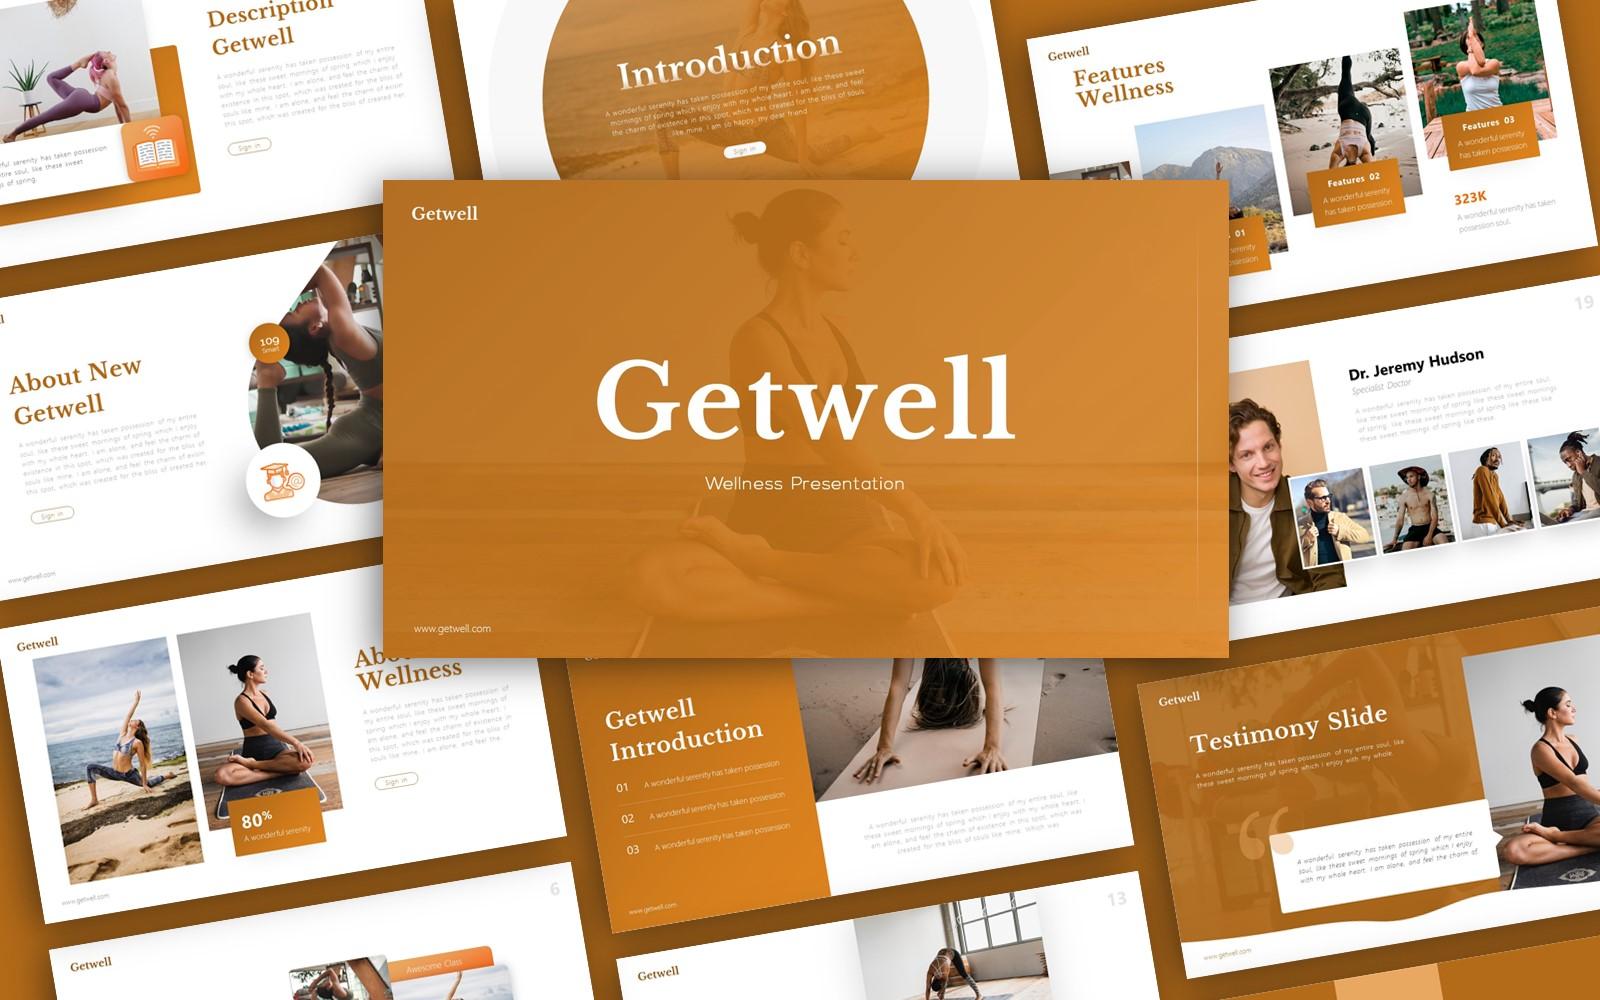 Getwell Wellness Presentation PowerPoint Template